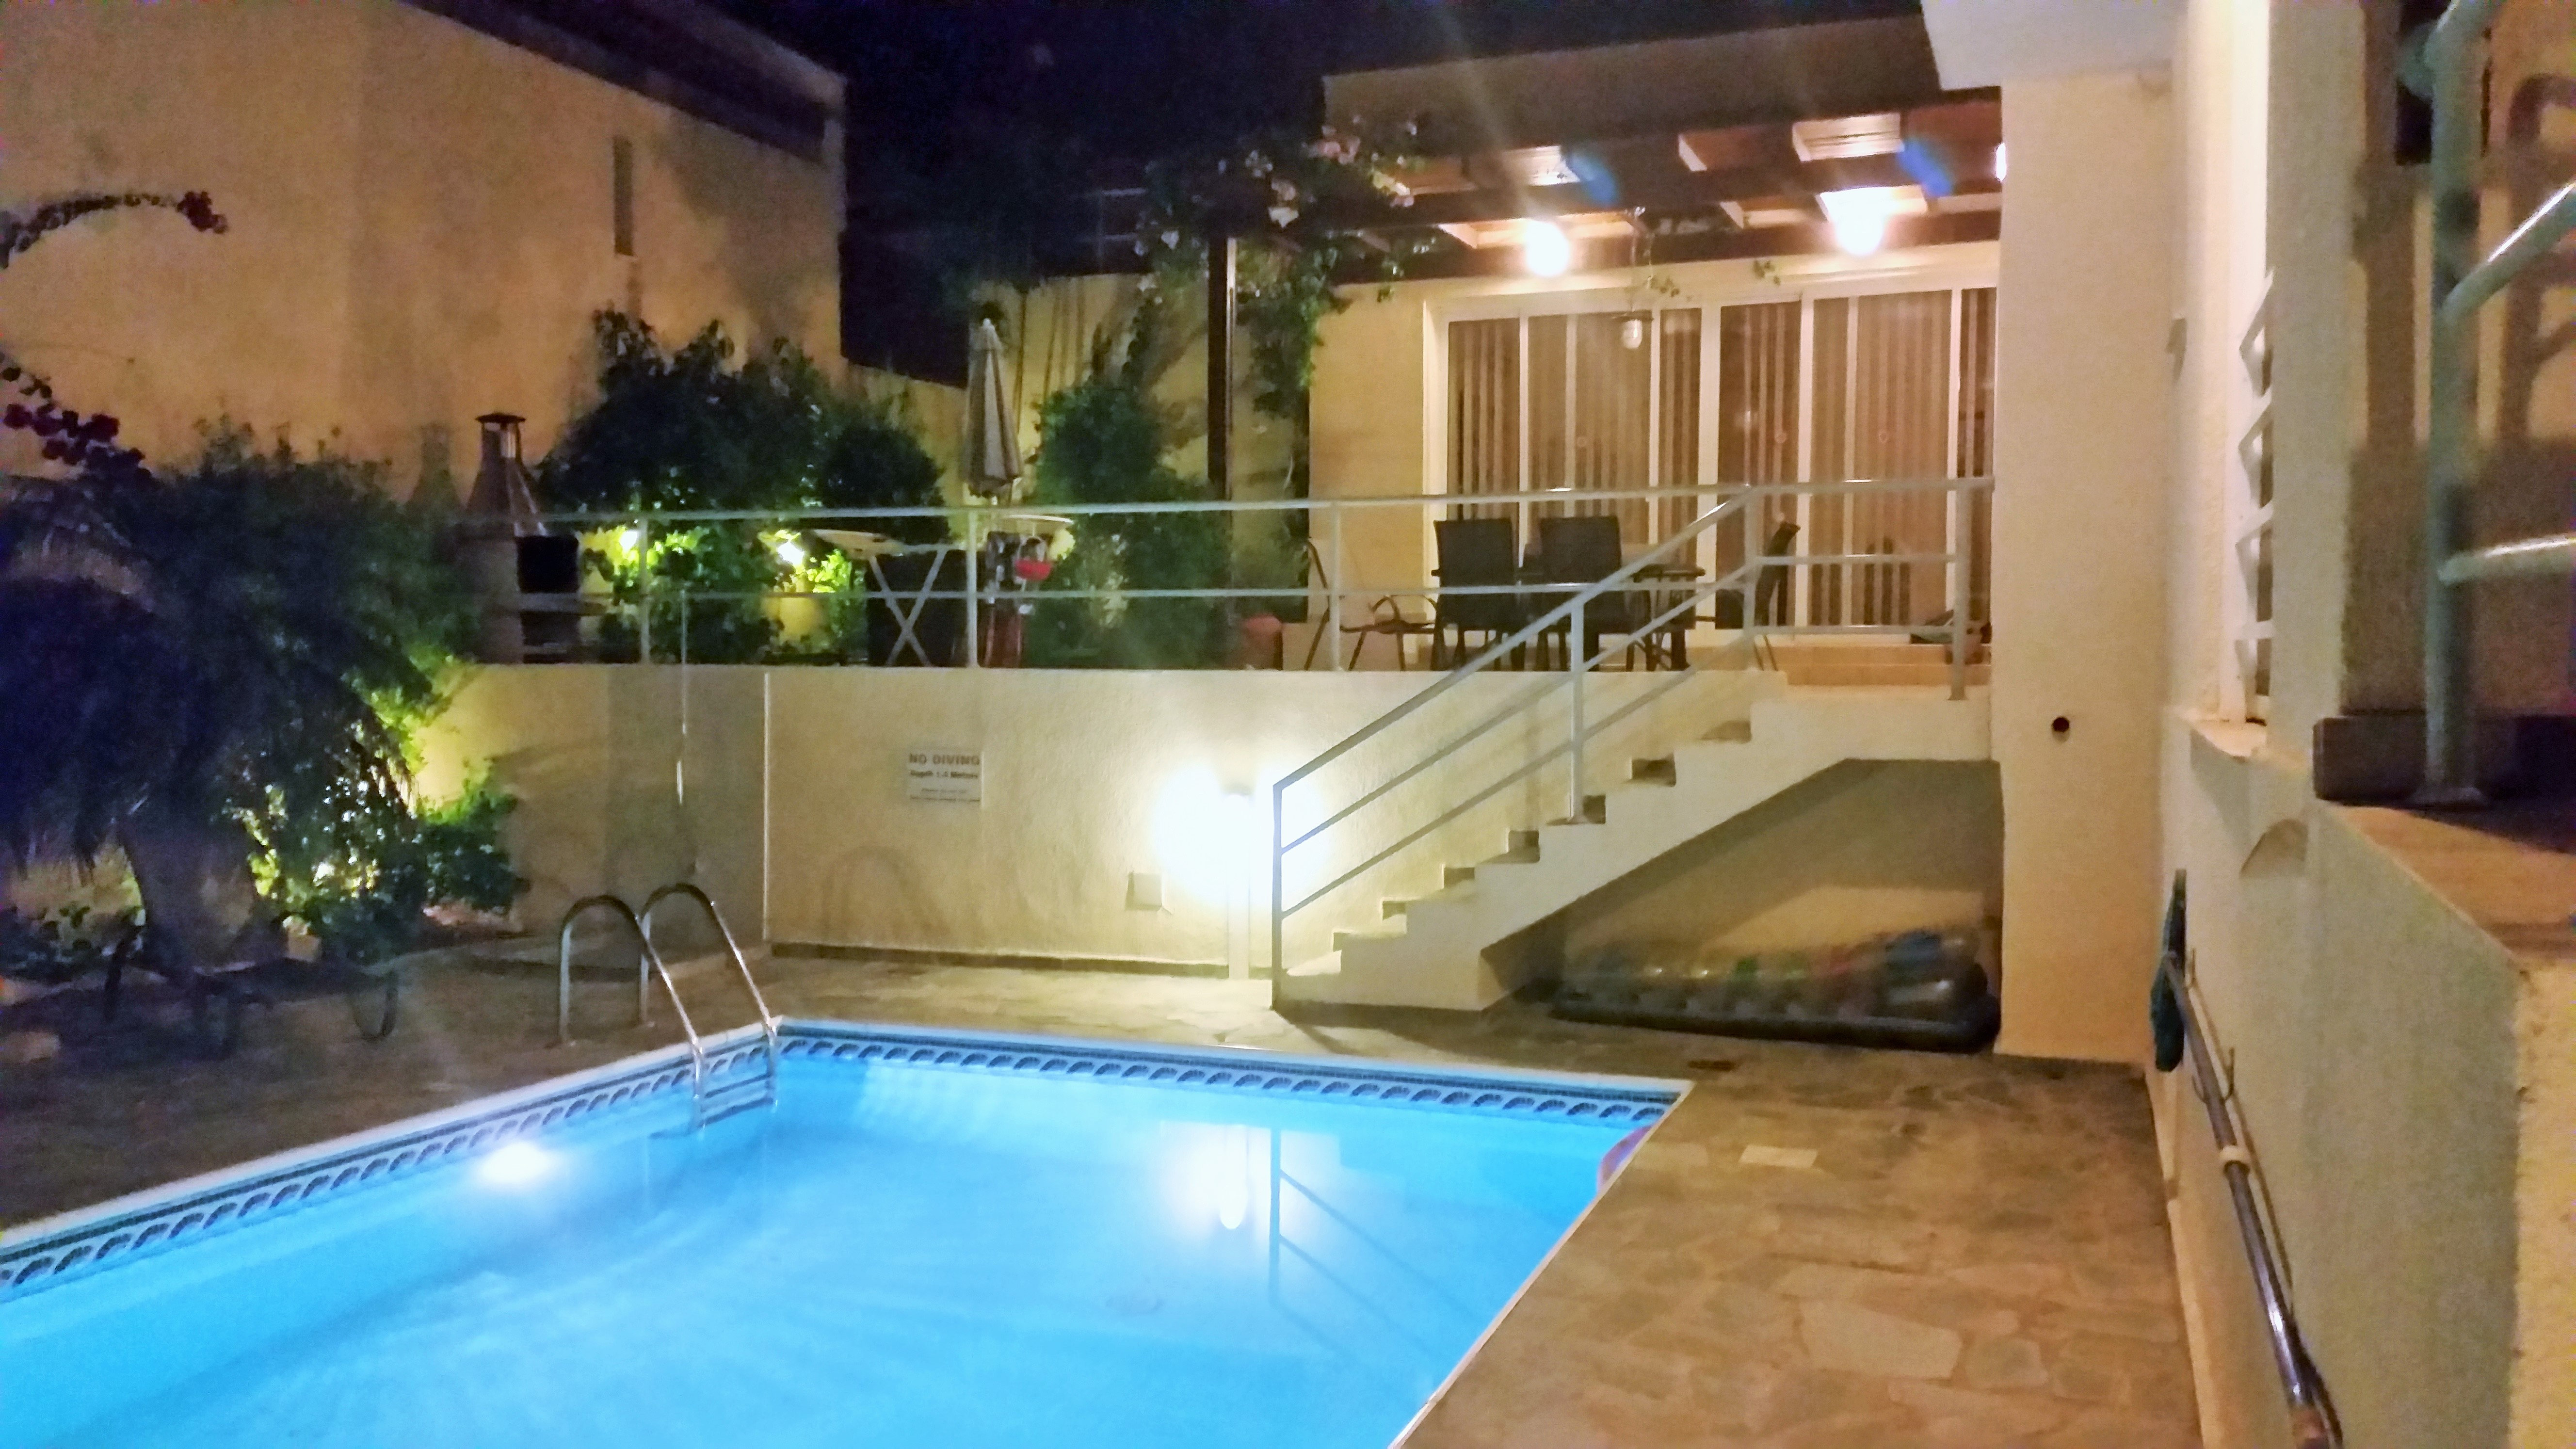 villa pheakon the pool at night. Black Bedroom Furniture Sets. Home Design Ideas